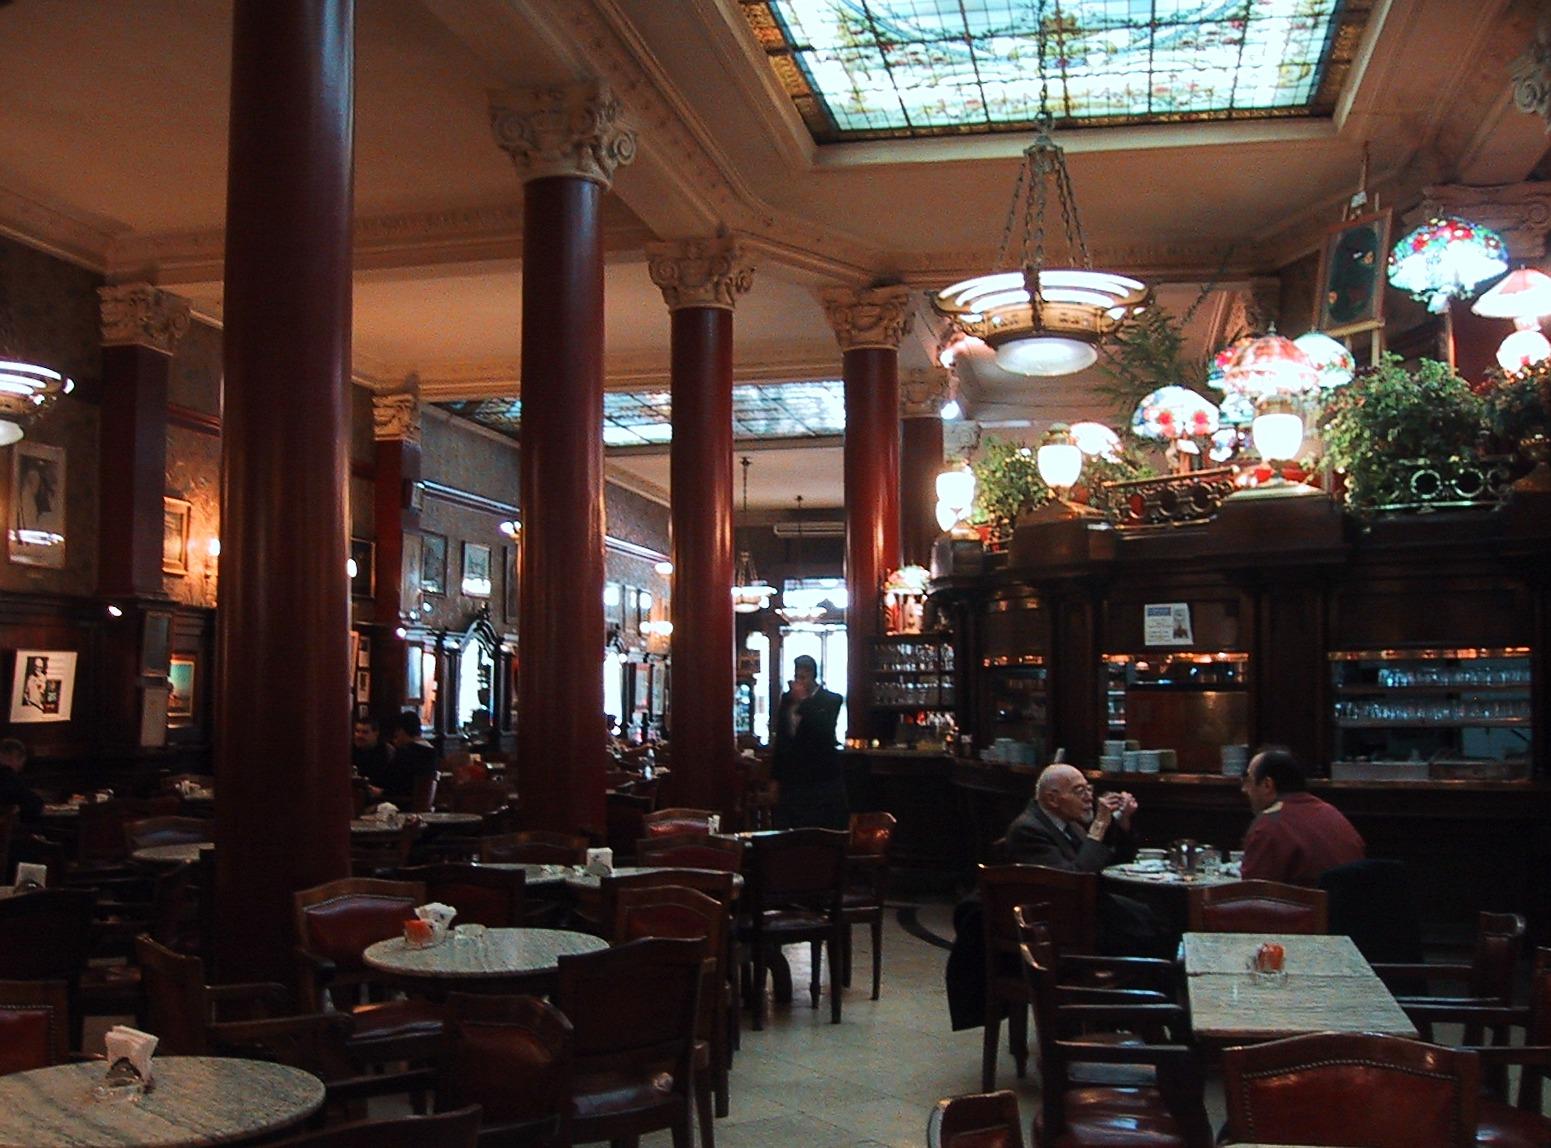 Caf Ef Bf Bd Bar El Chato Portaje Espagne